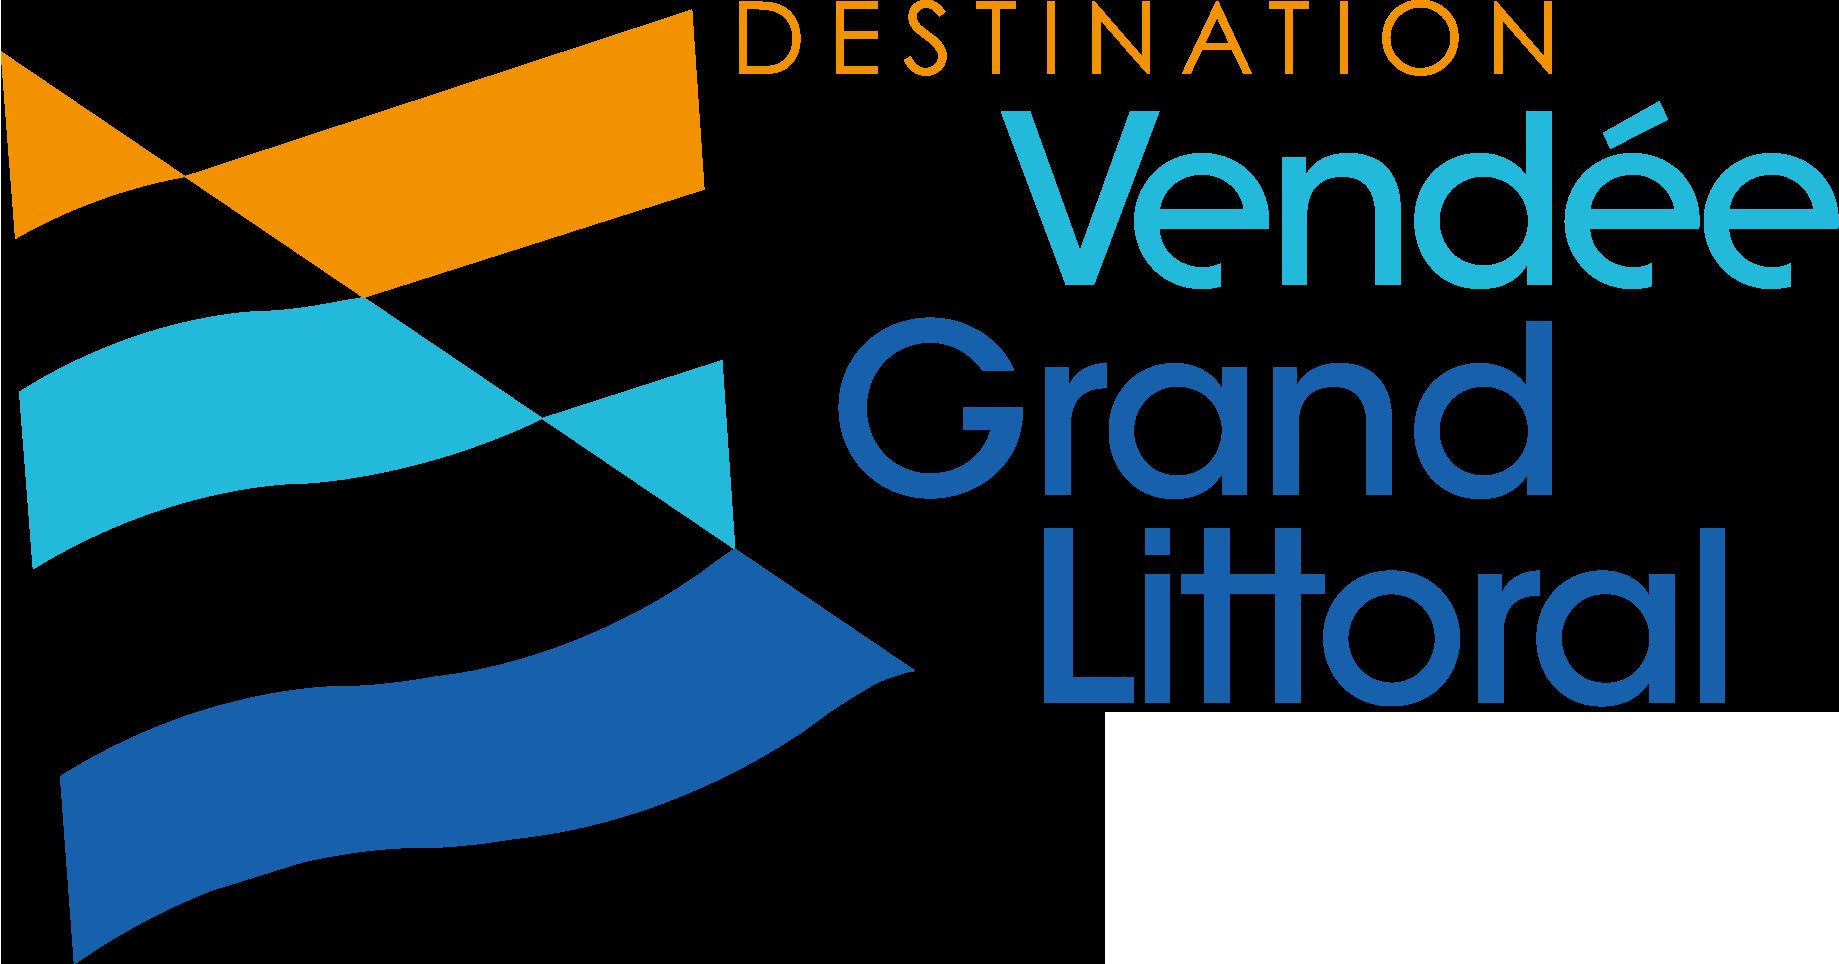 Randonnee Pedestre Vendee Calendrier 2020.Office De Tourisme Destination Vendee Grand Littoral